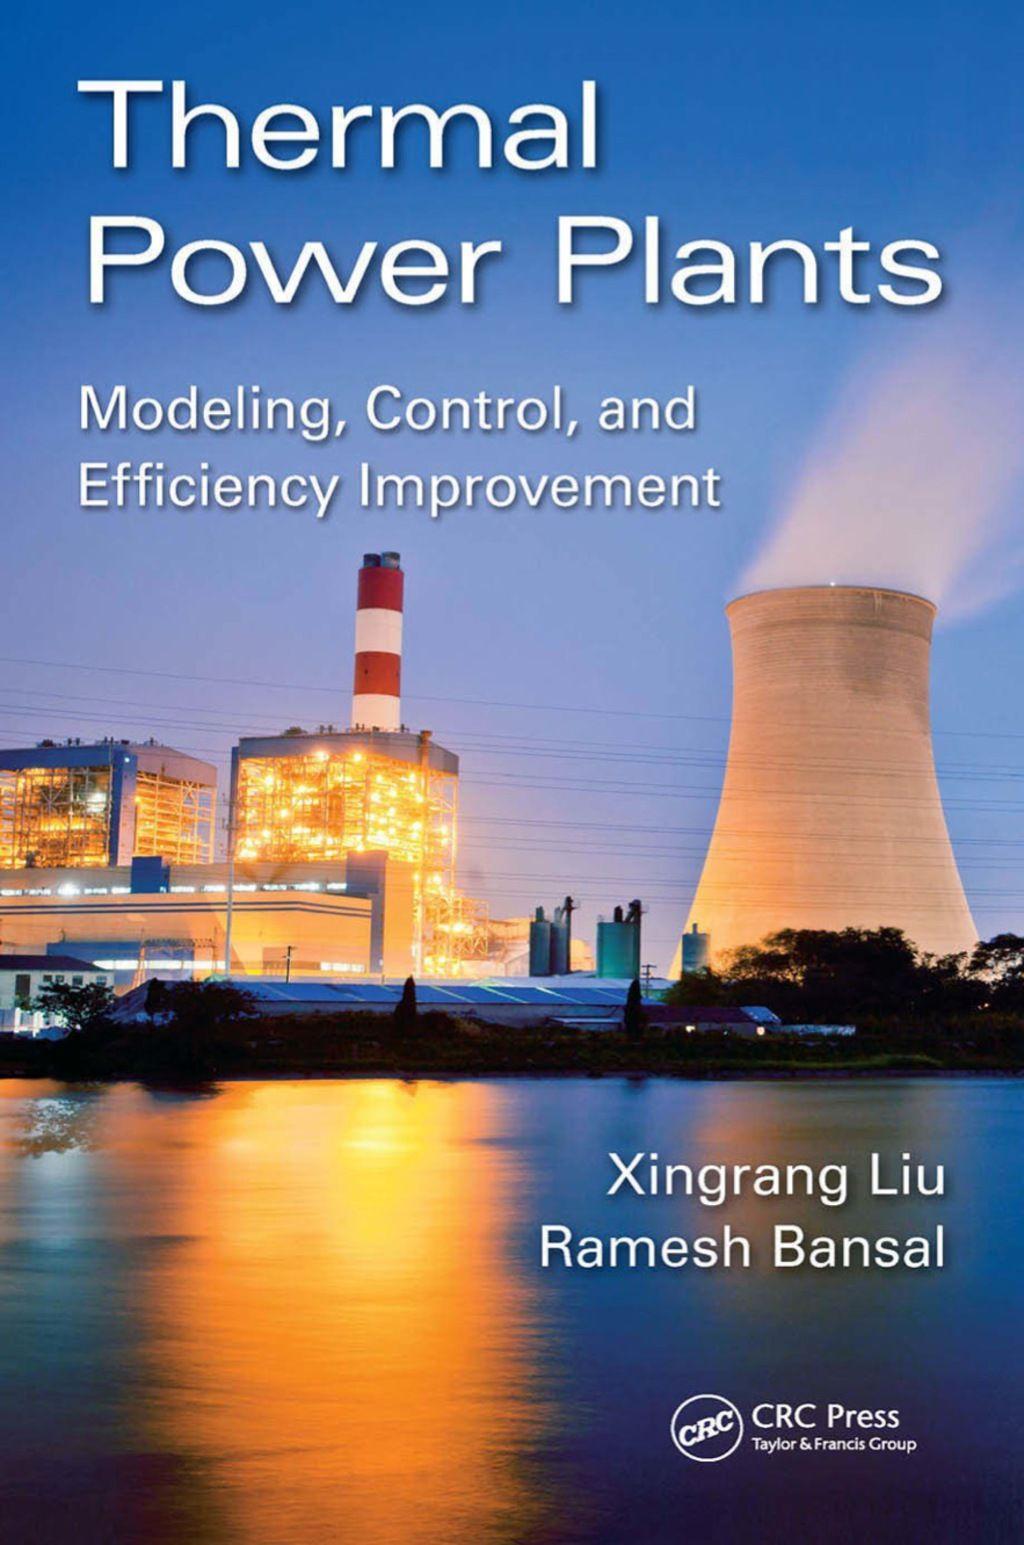 Thermal Power Plants (eBook Rental) Thermal power plant